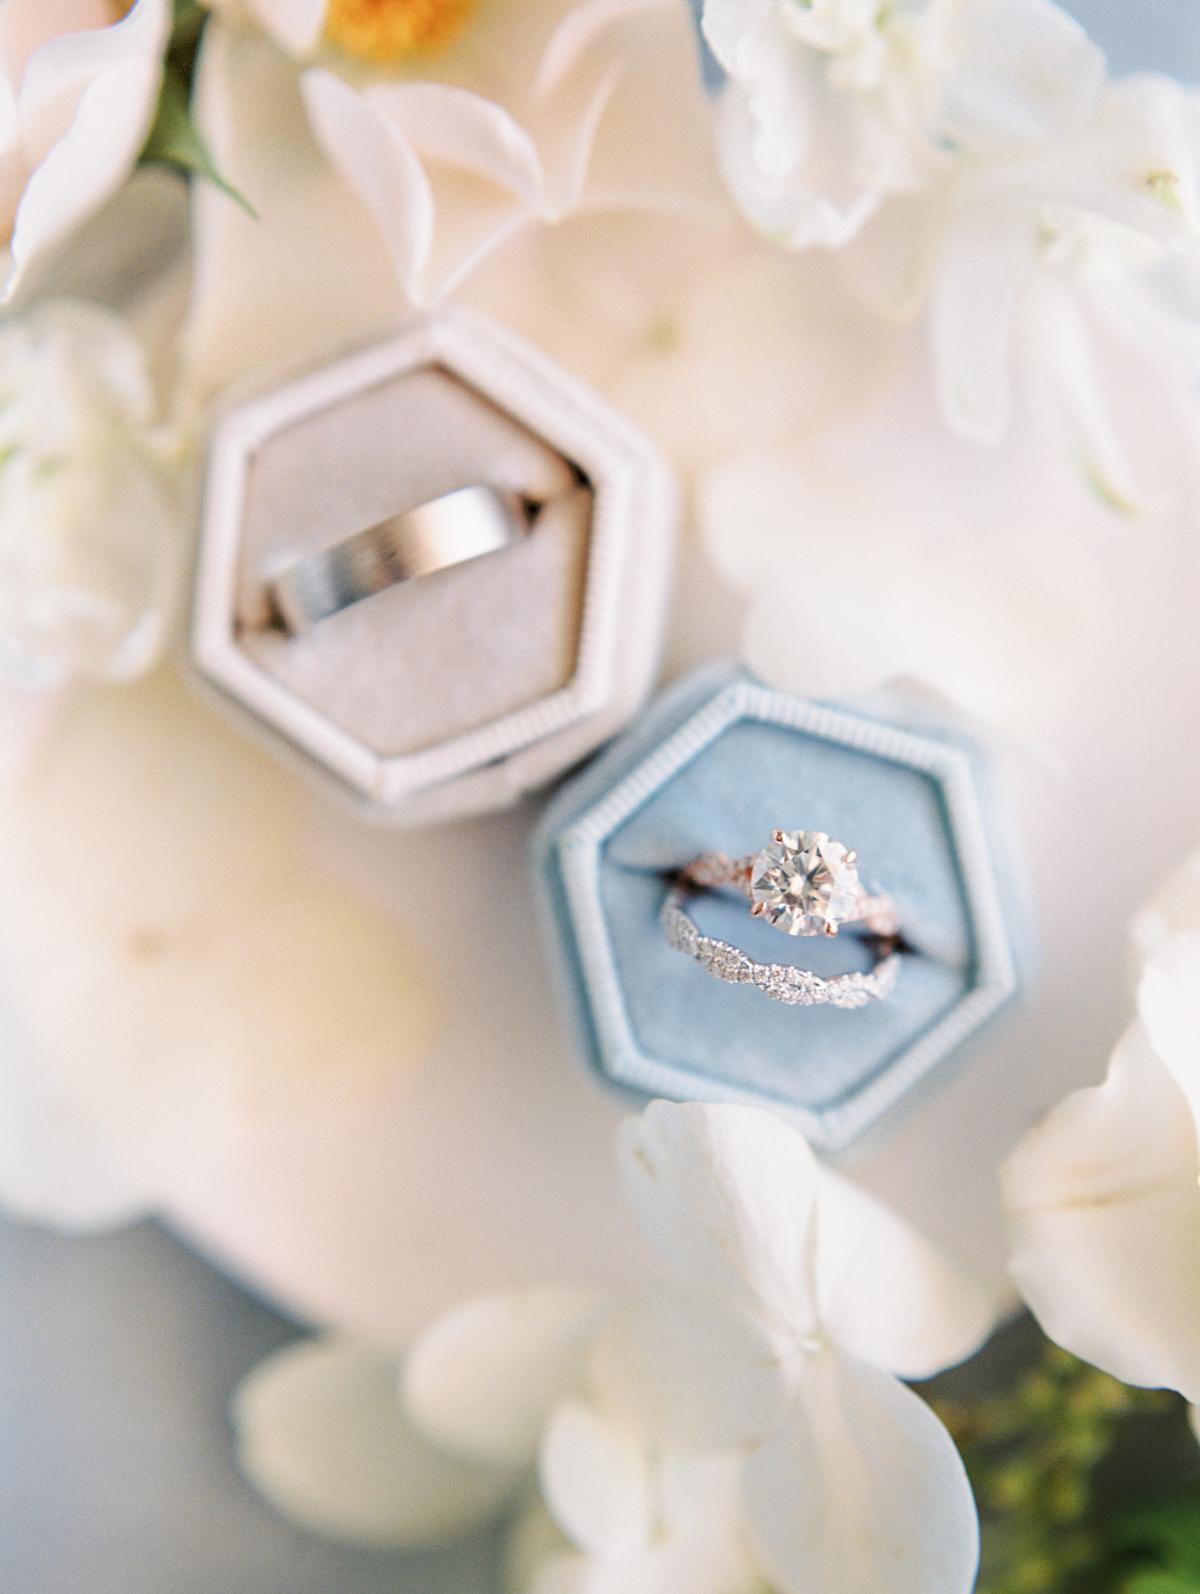 bettina gino wedding rings in box